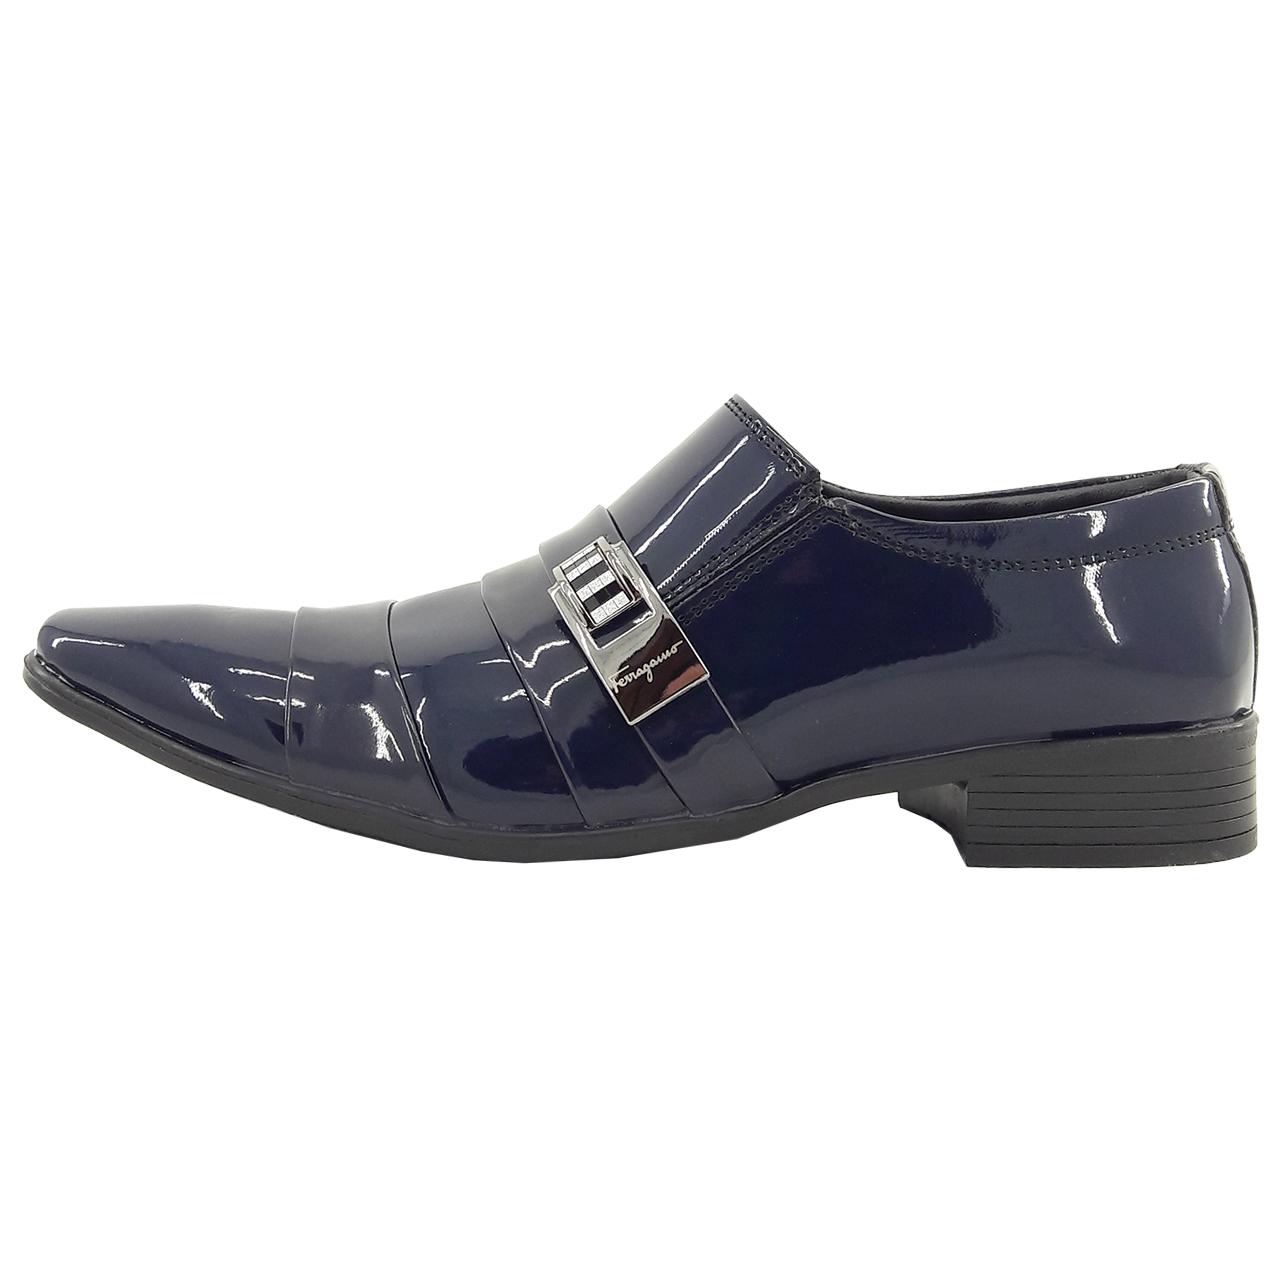 کفش مردانه فیو گاما مدل Mhrd.nvy.f.01